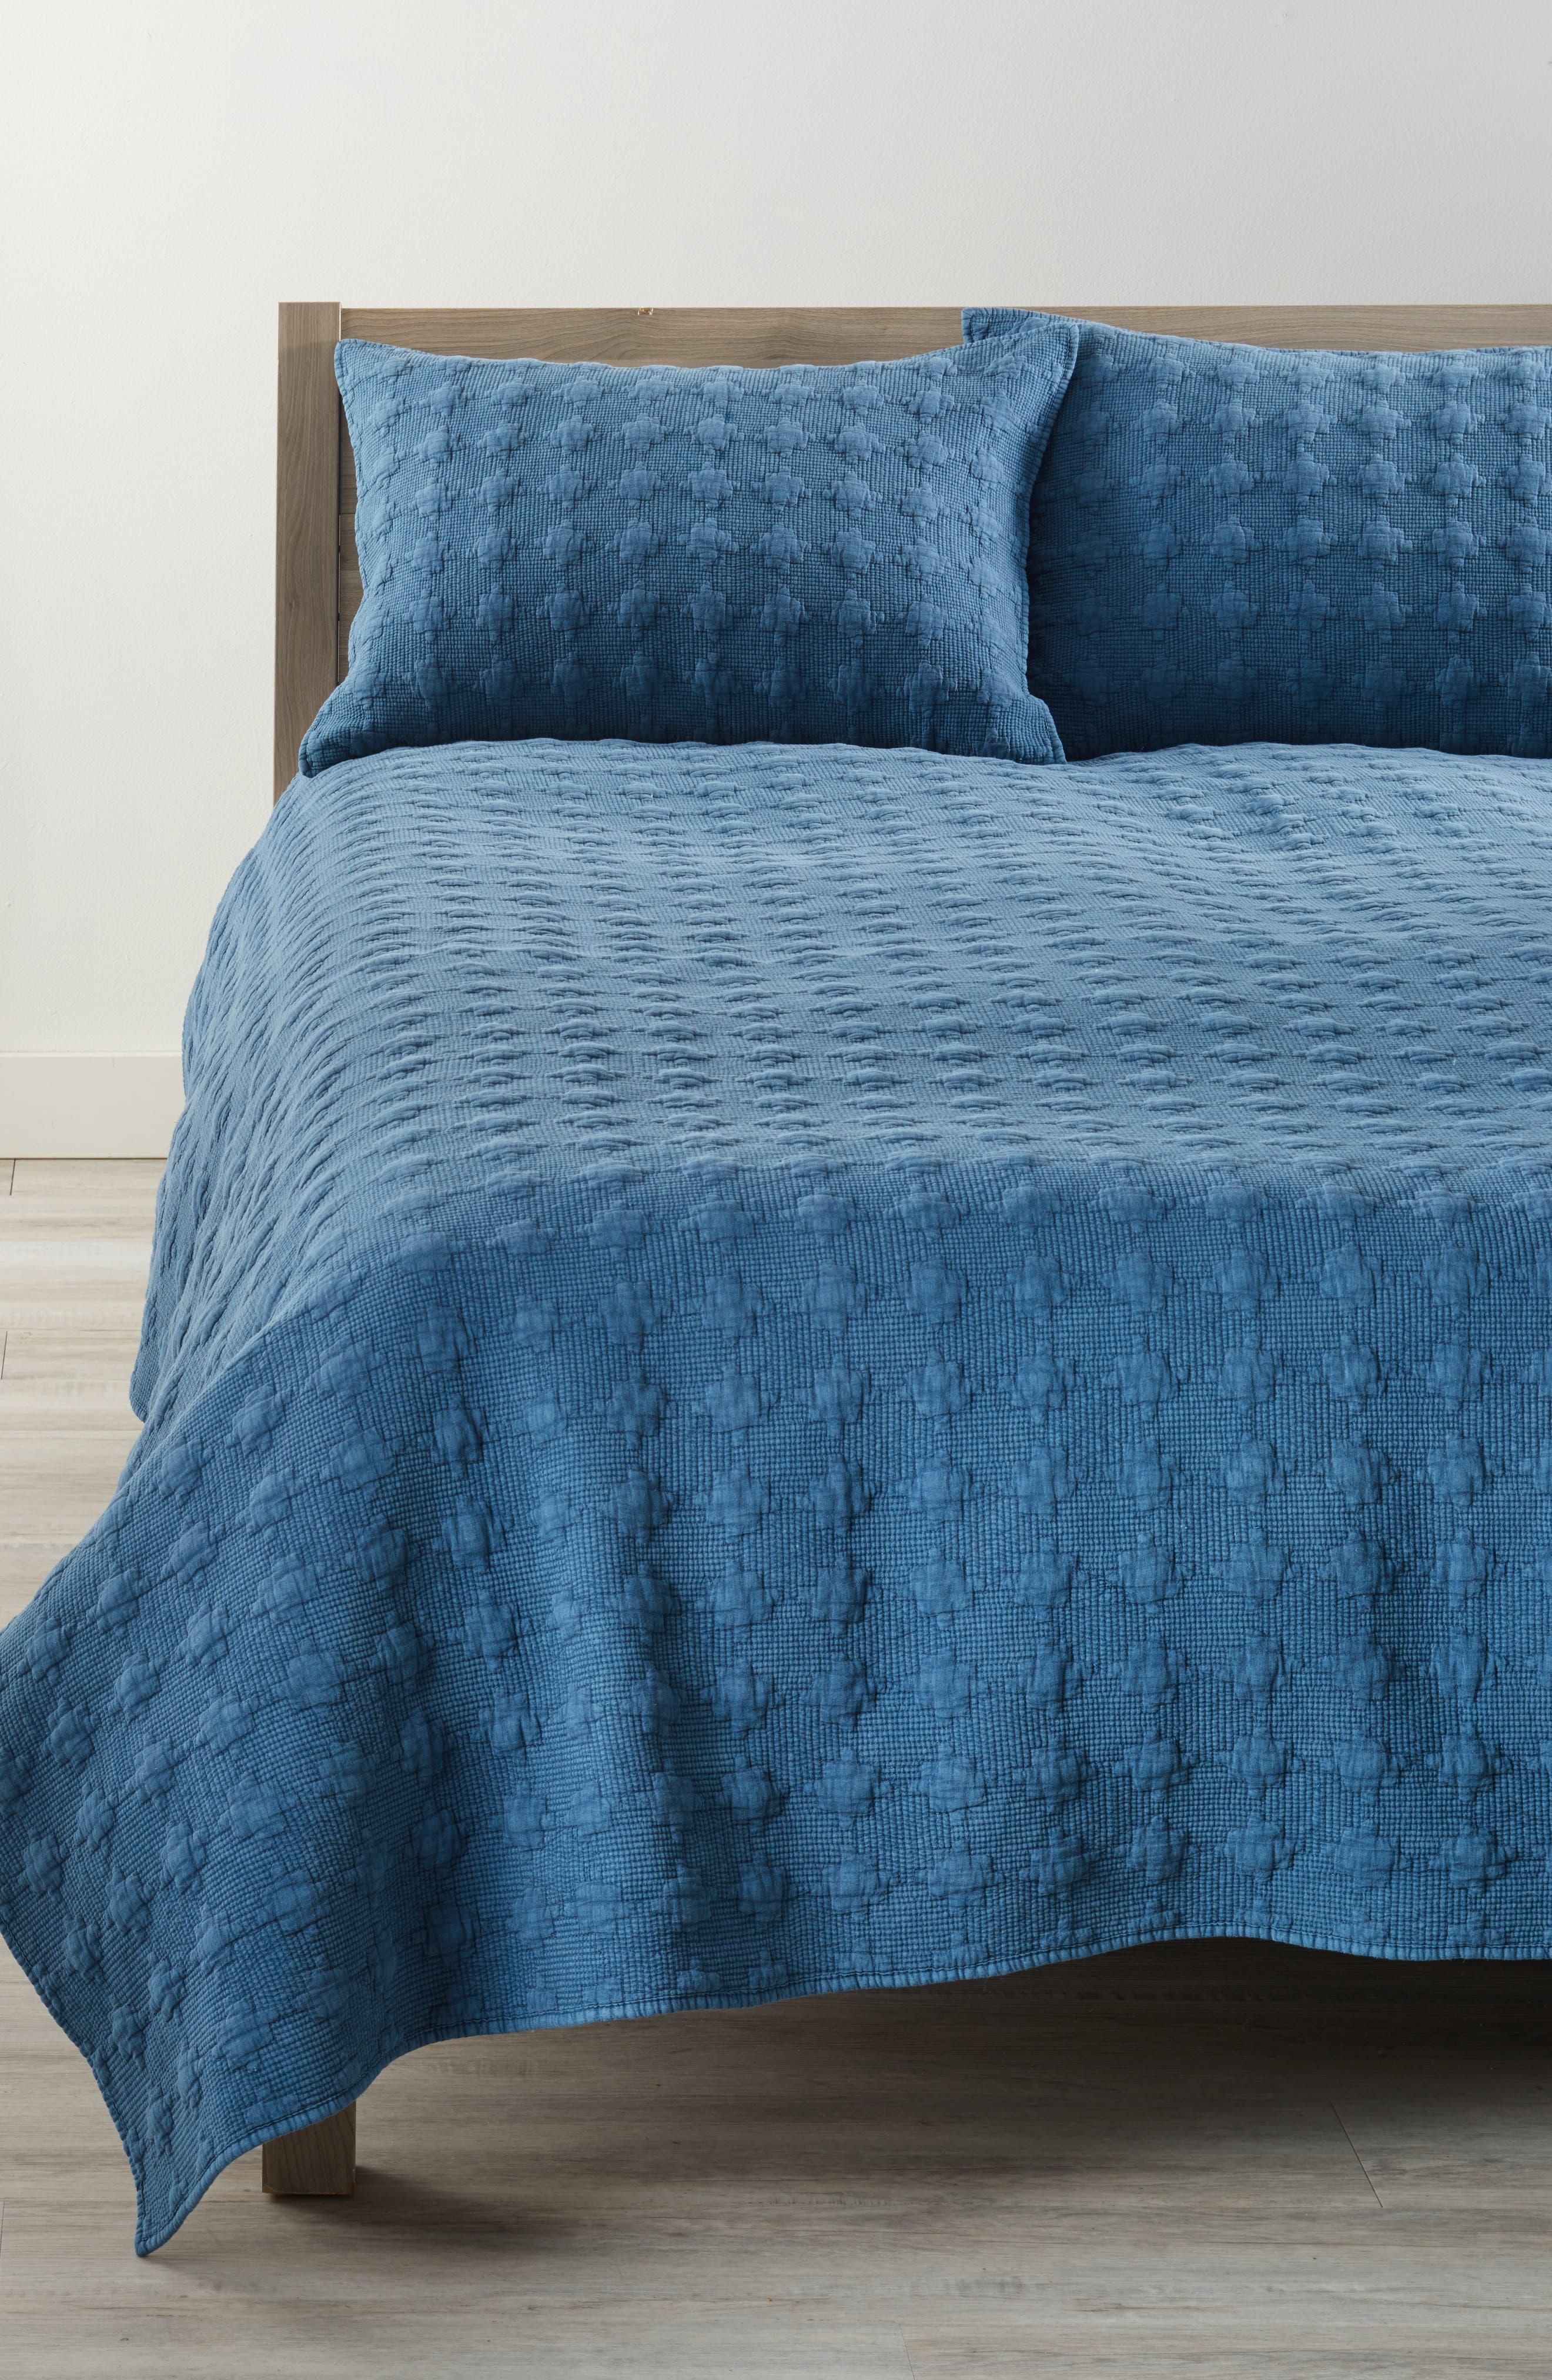 Nordstrom at Home Garment Wash Quilt